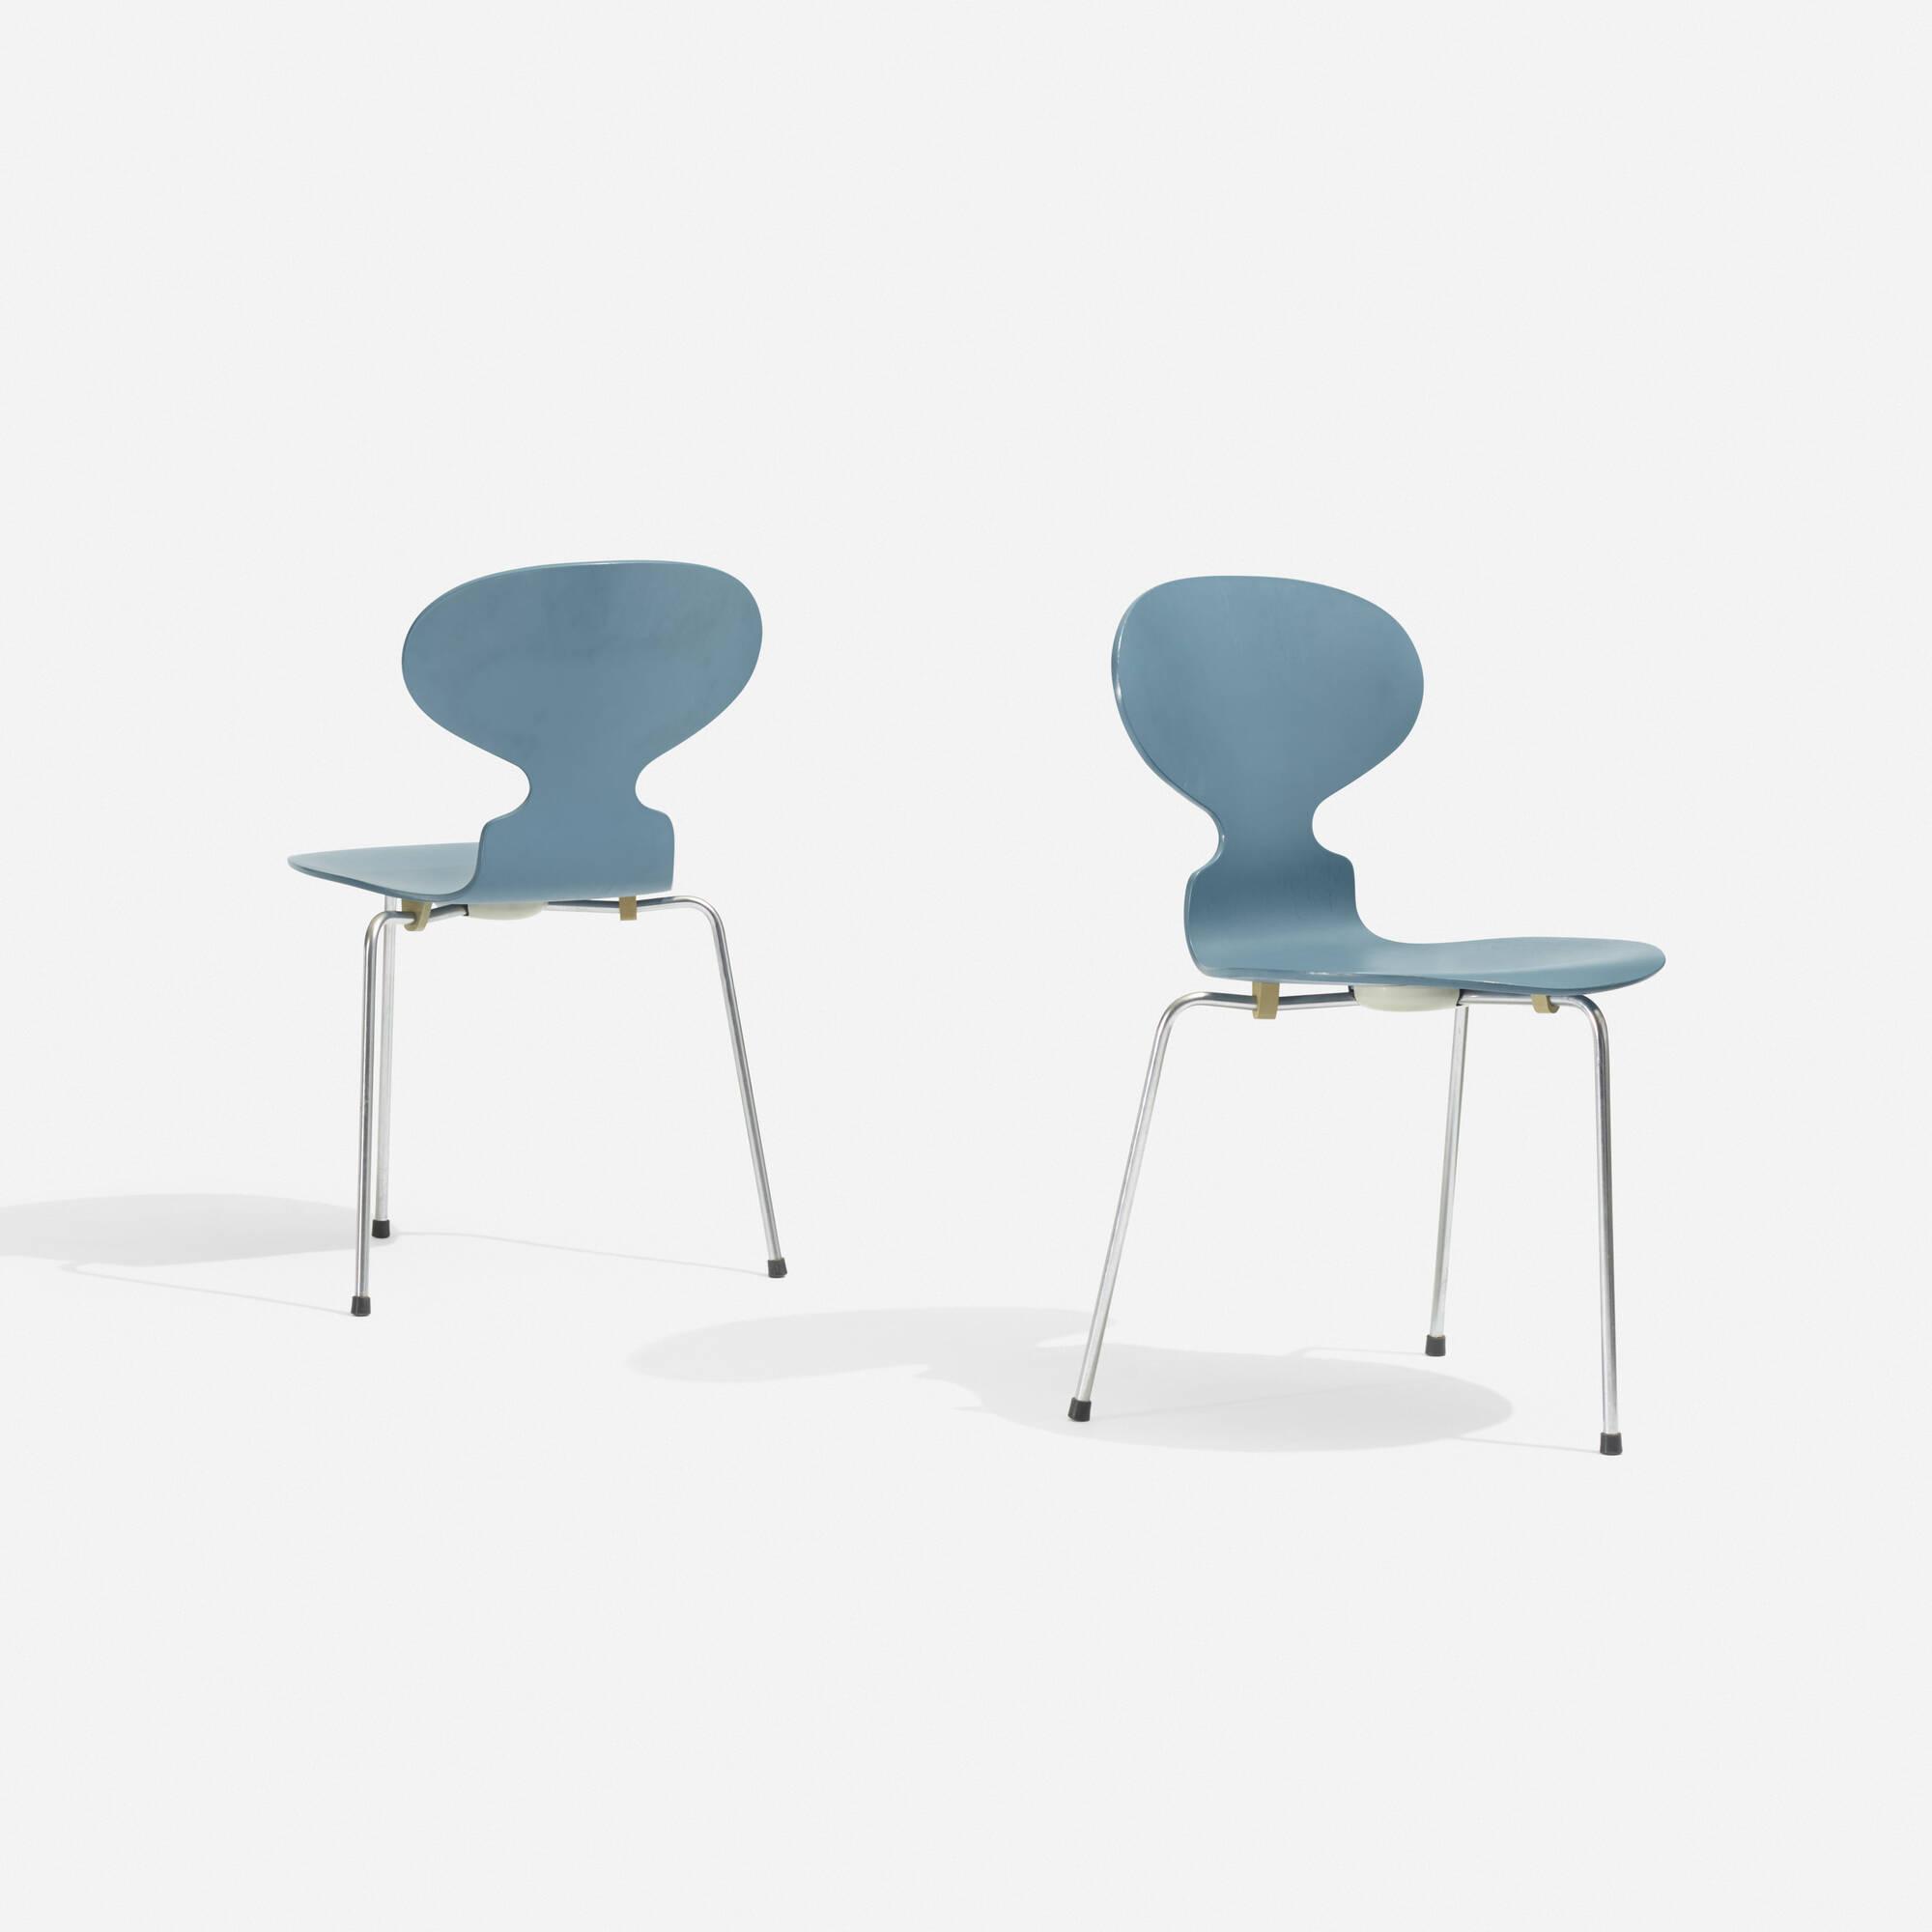 223 Arne Jacobsen Ant Chair Pair Scandinavian Design 18 May